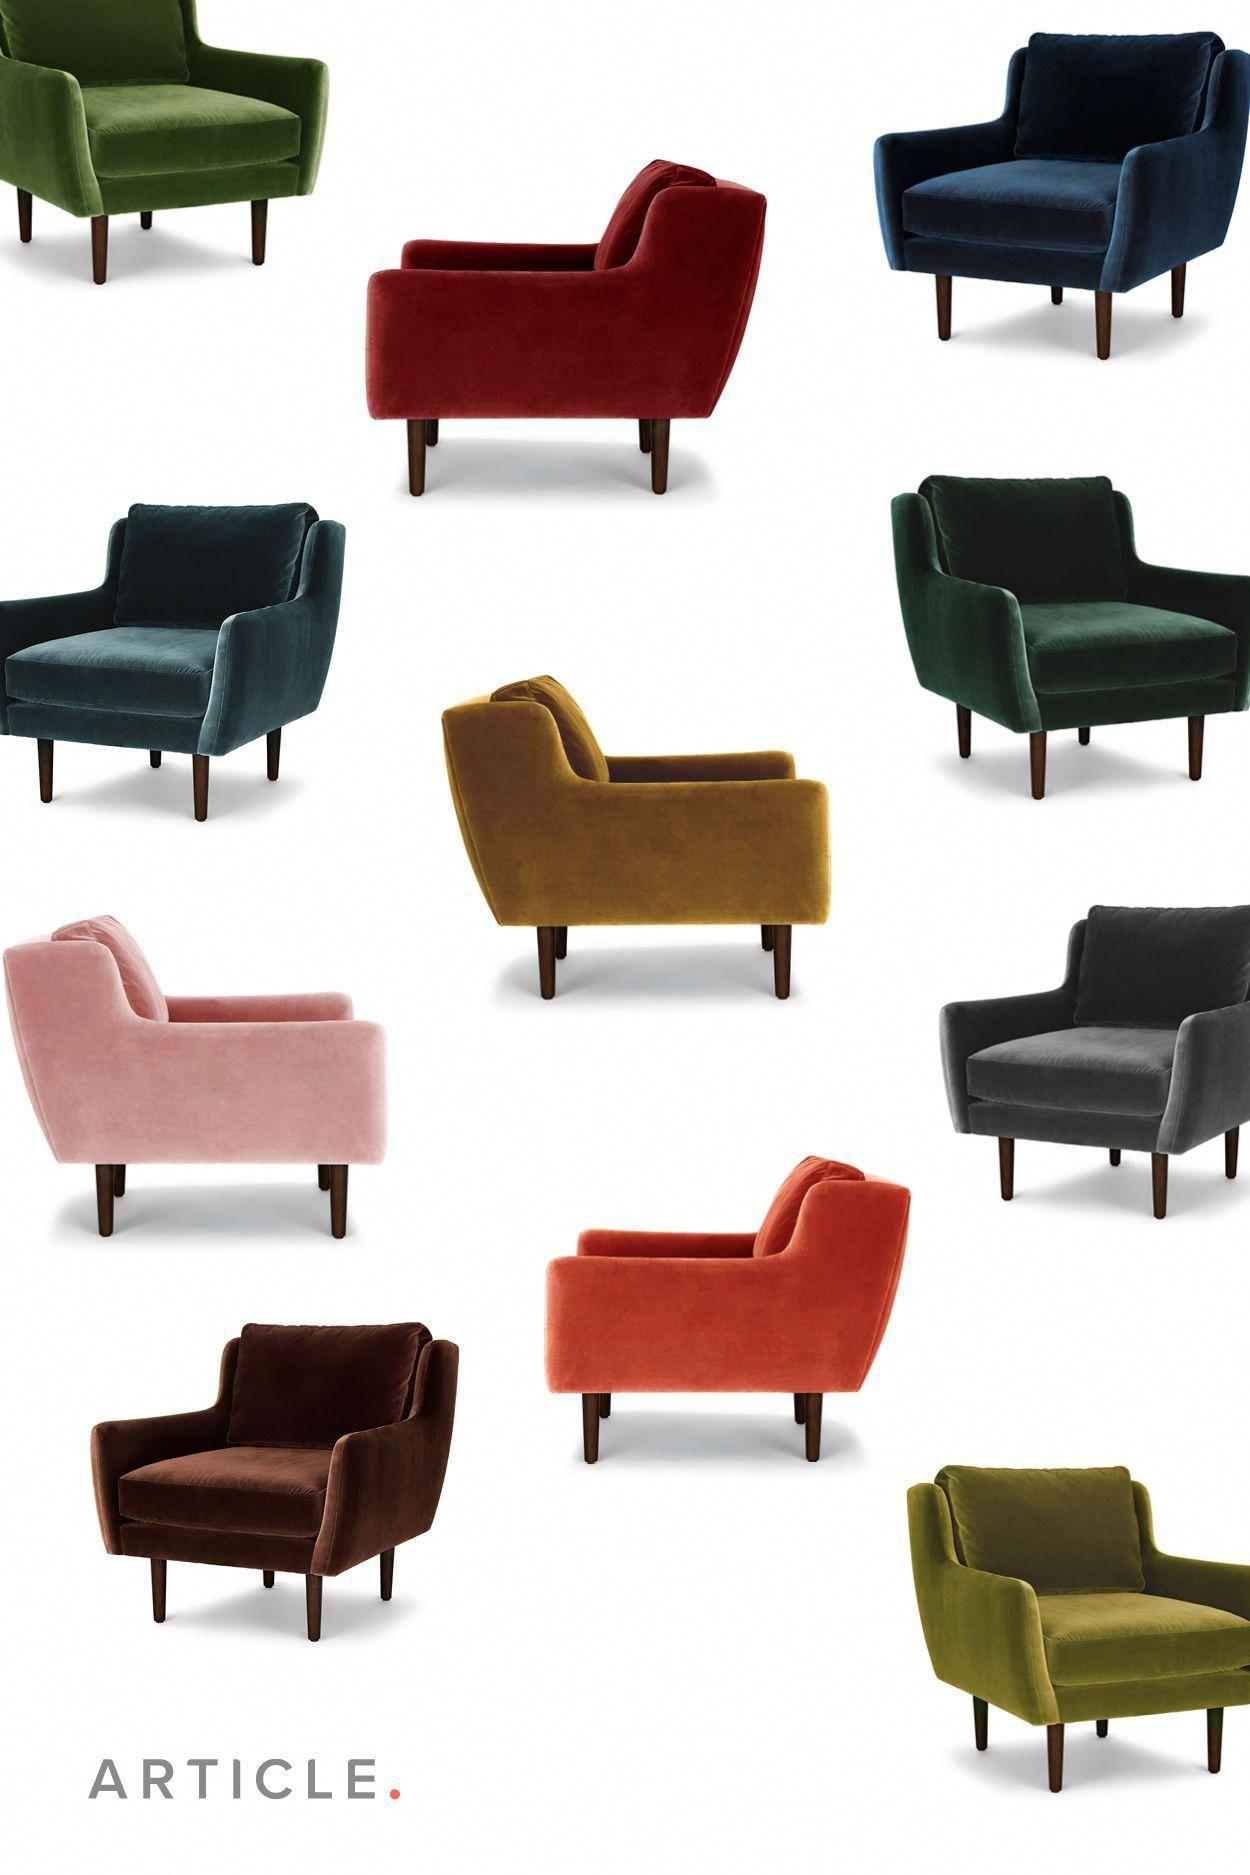 Vivacious velvets and twelve of them the matrix chair line has